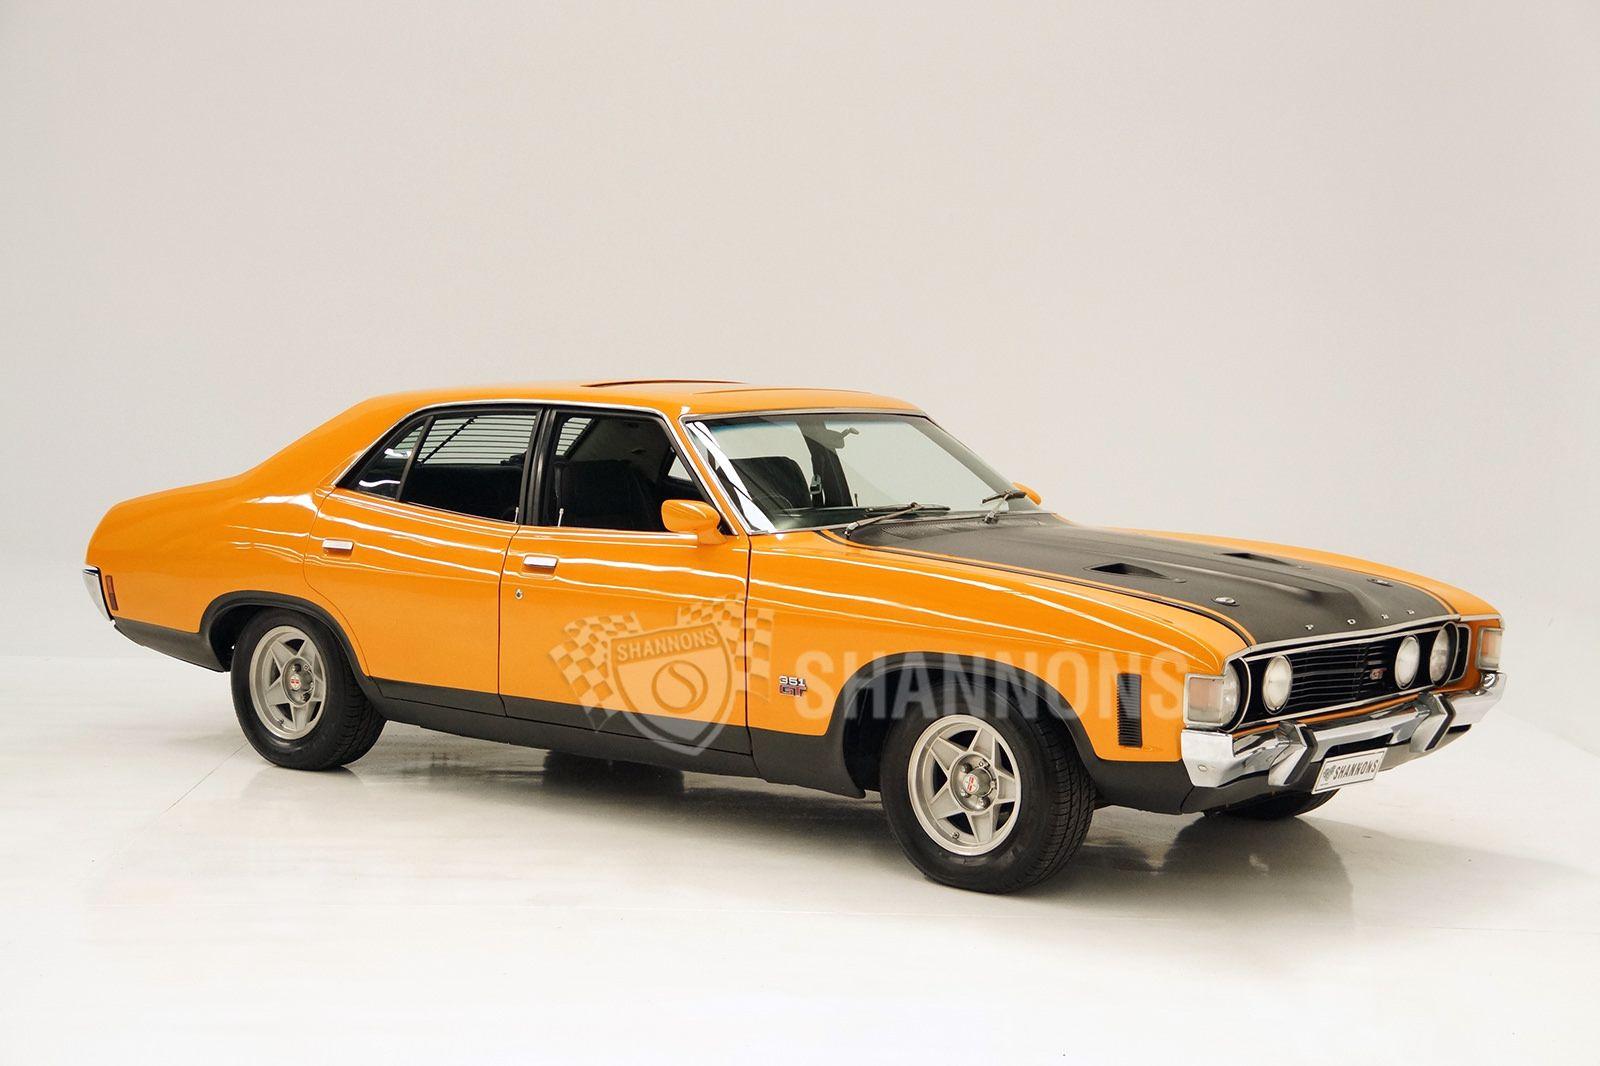 1973 Ford Falcon XA GT